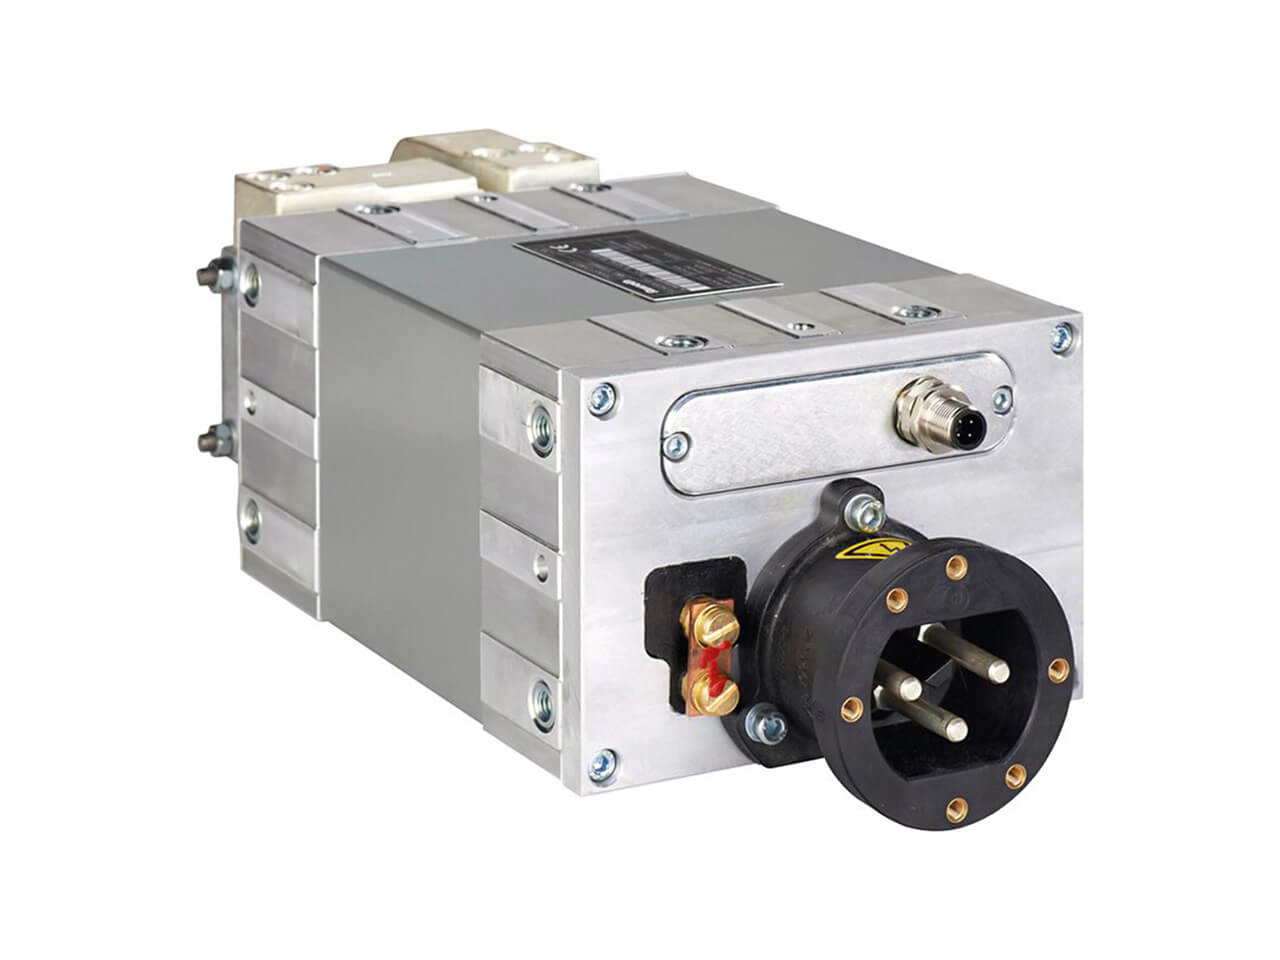 Medium Frequency Welding Transformer – PSG 3075.11 PSV